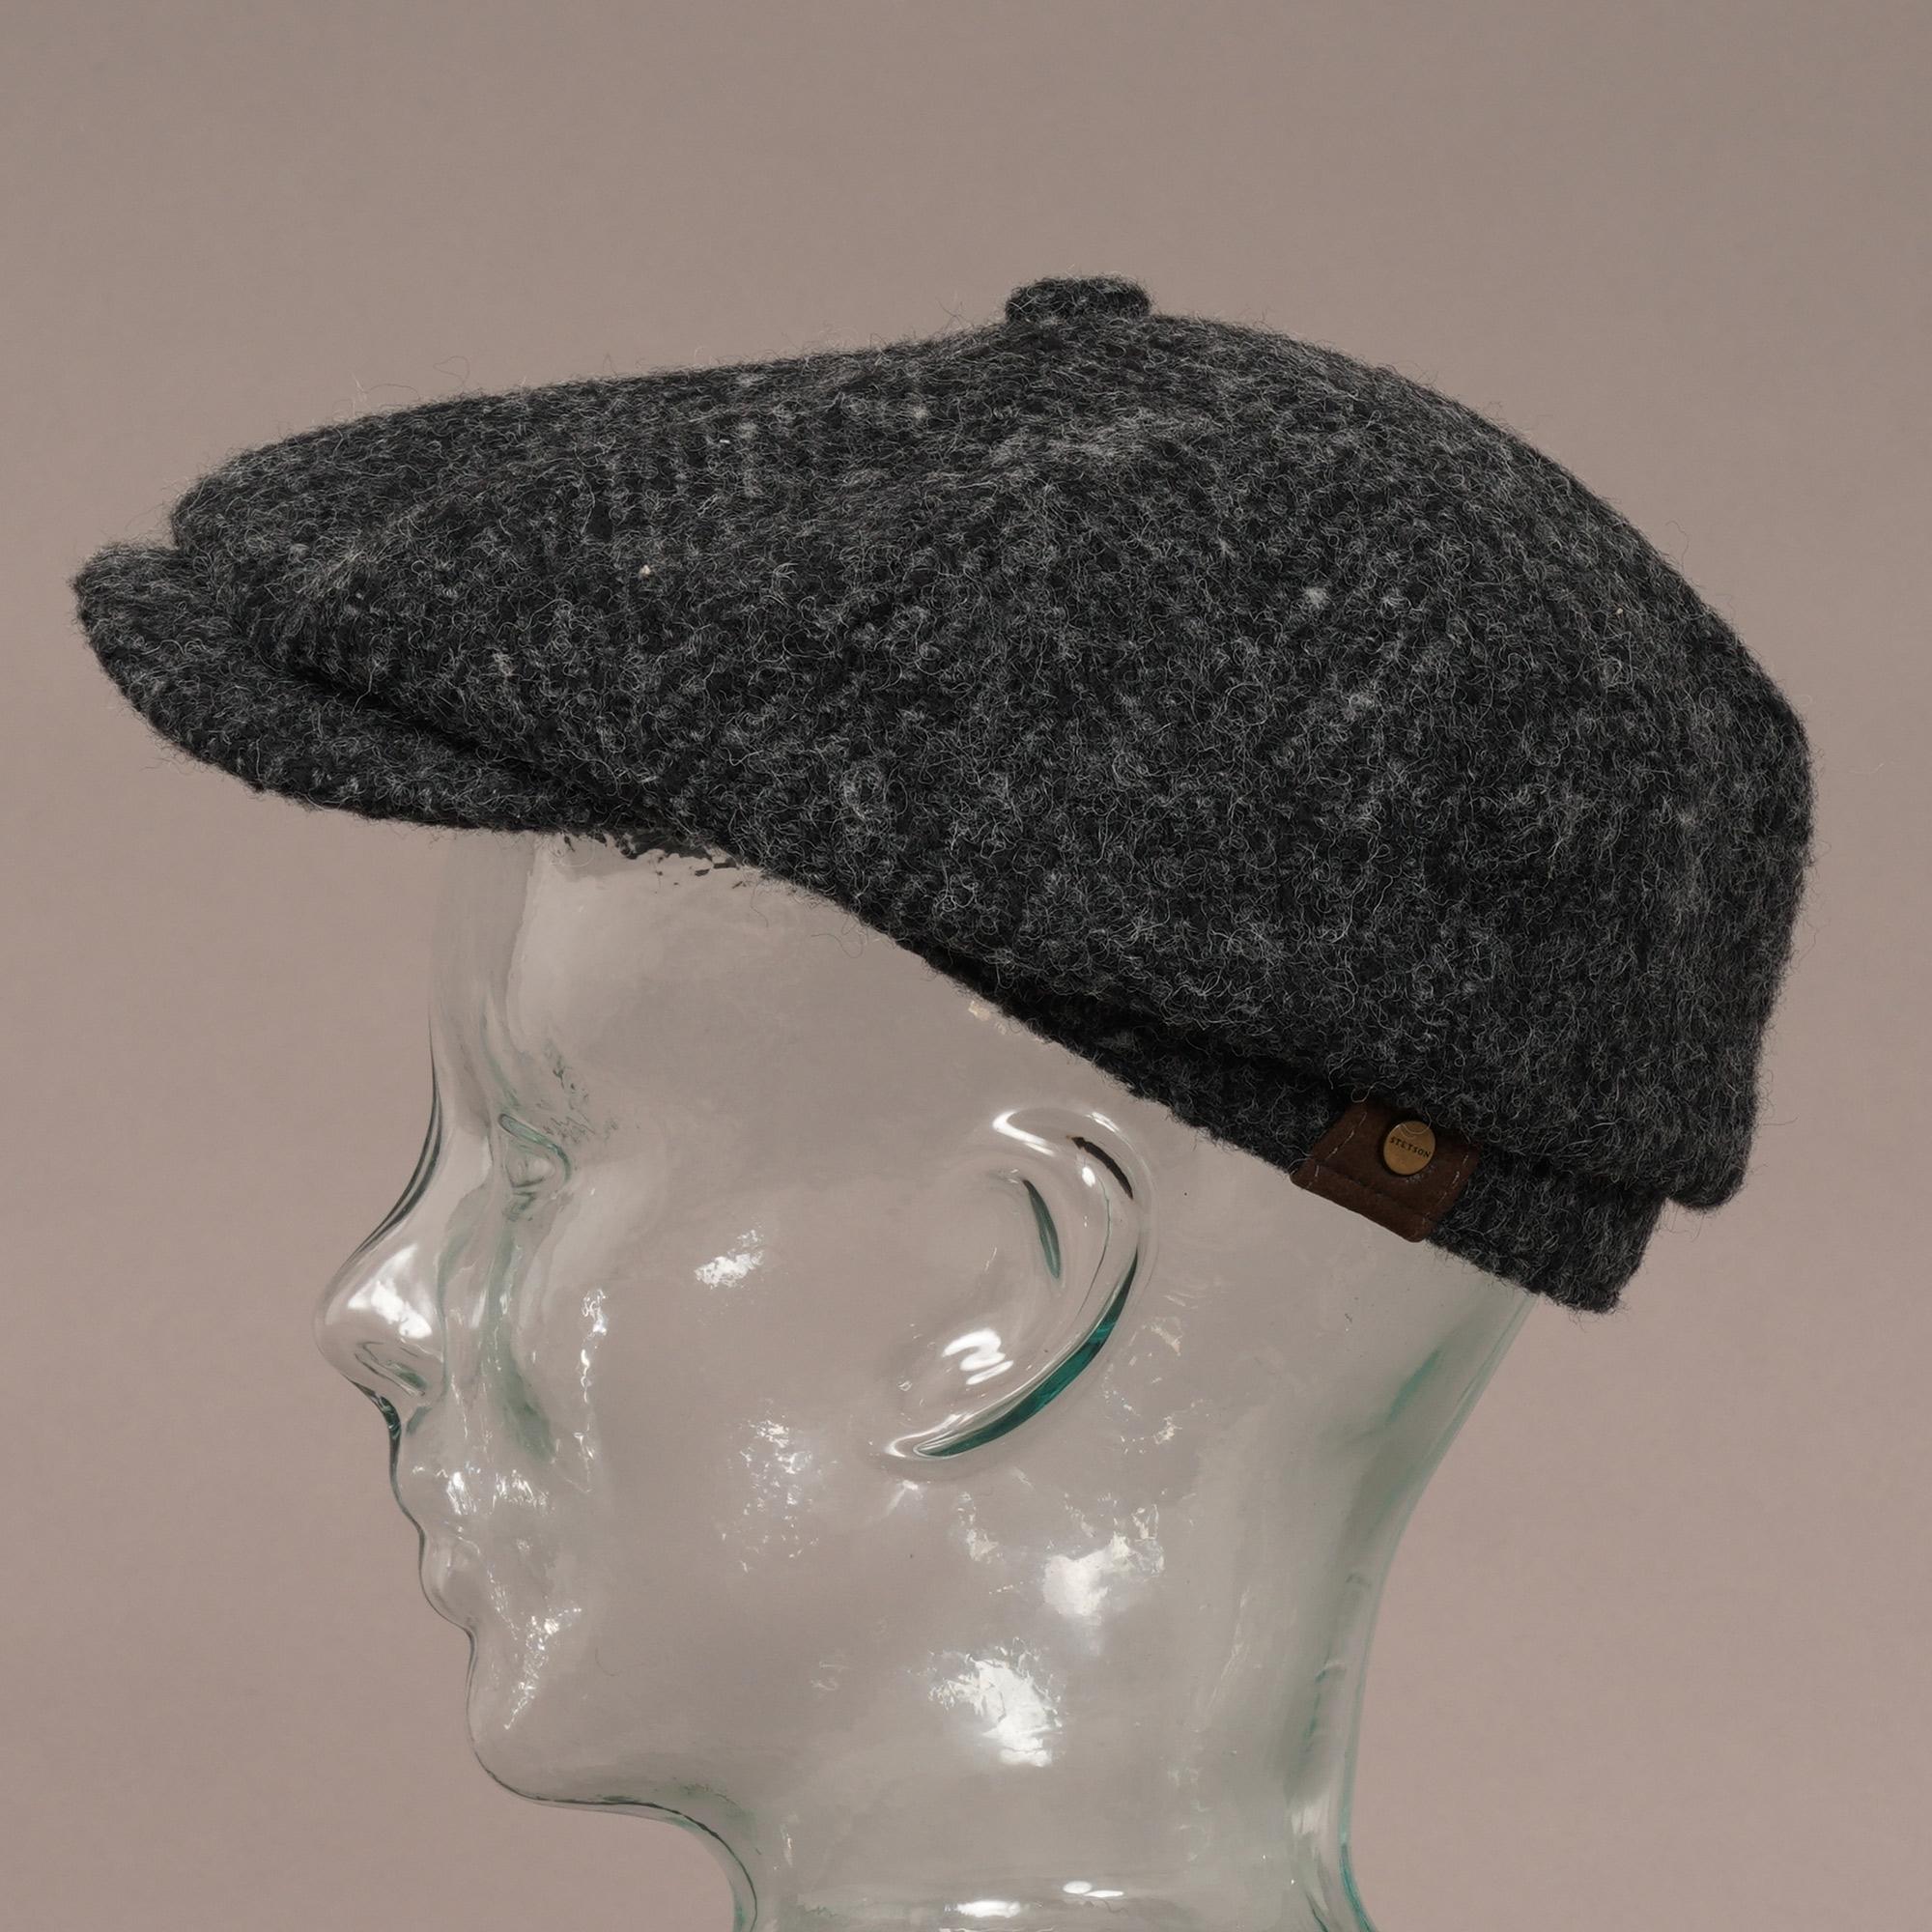 077d3f456 Wool Hatteras Cap - Black